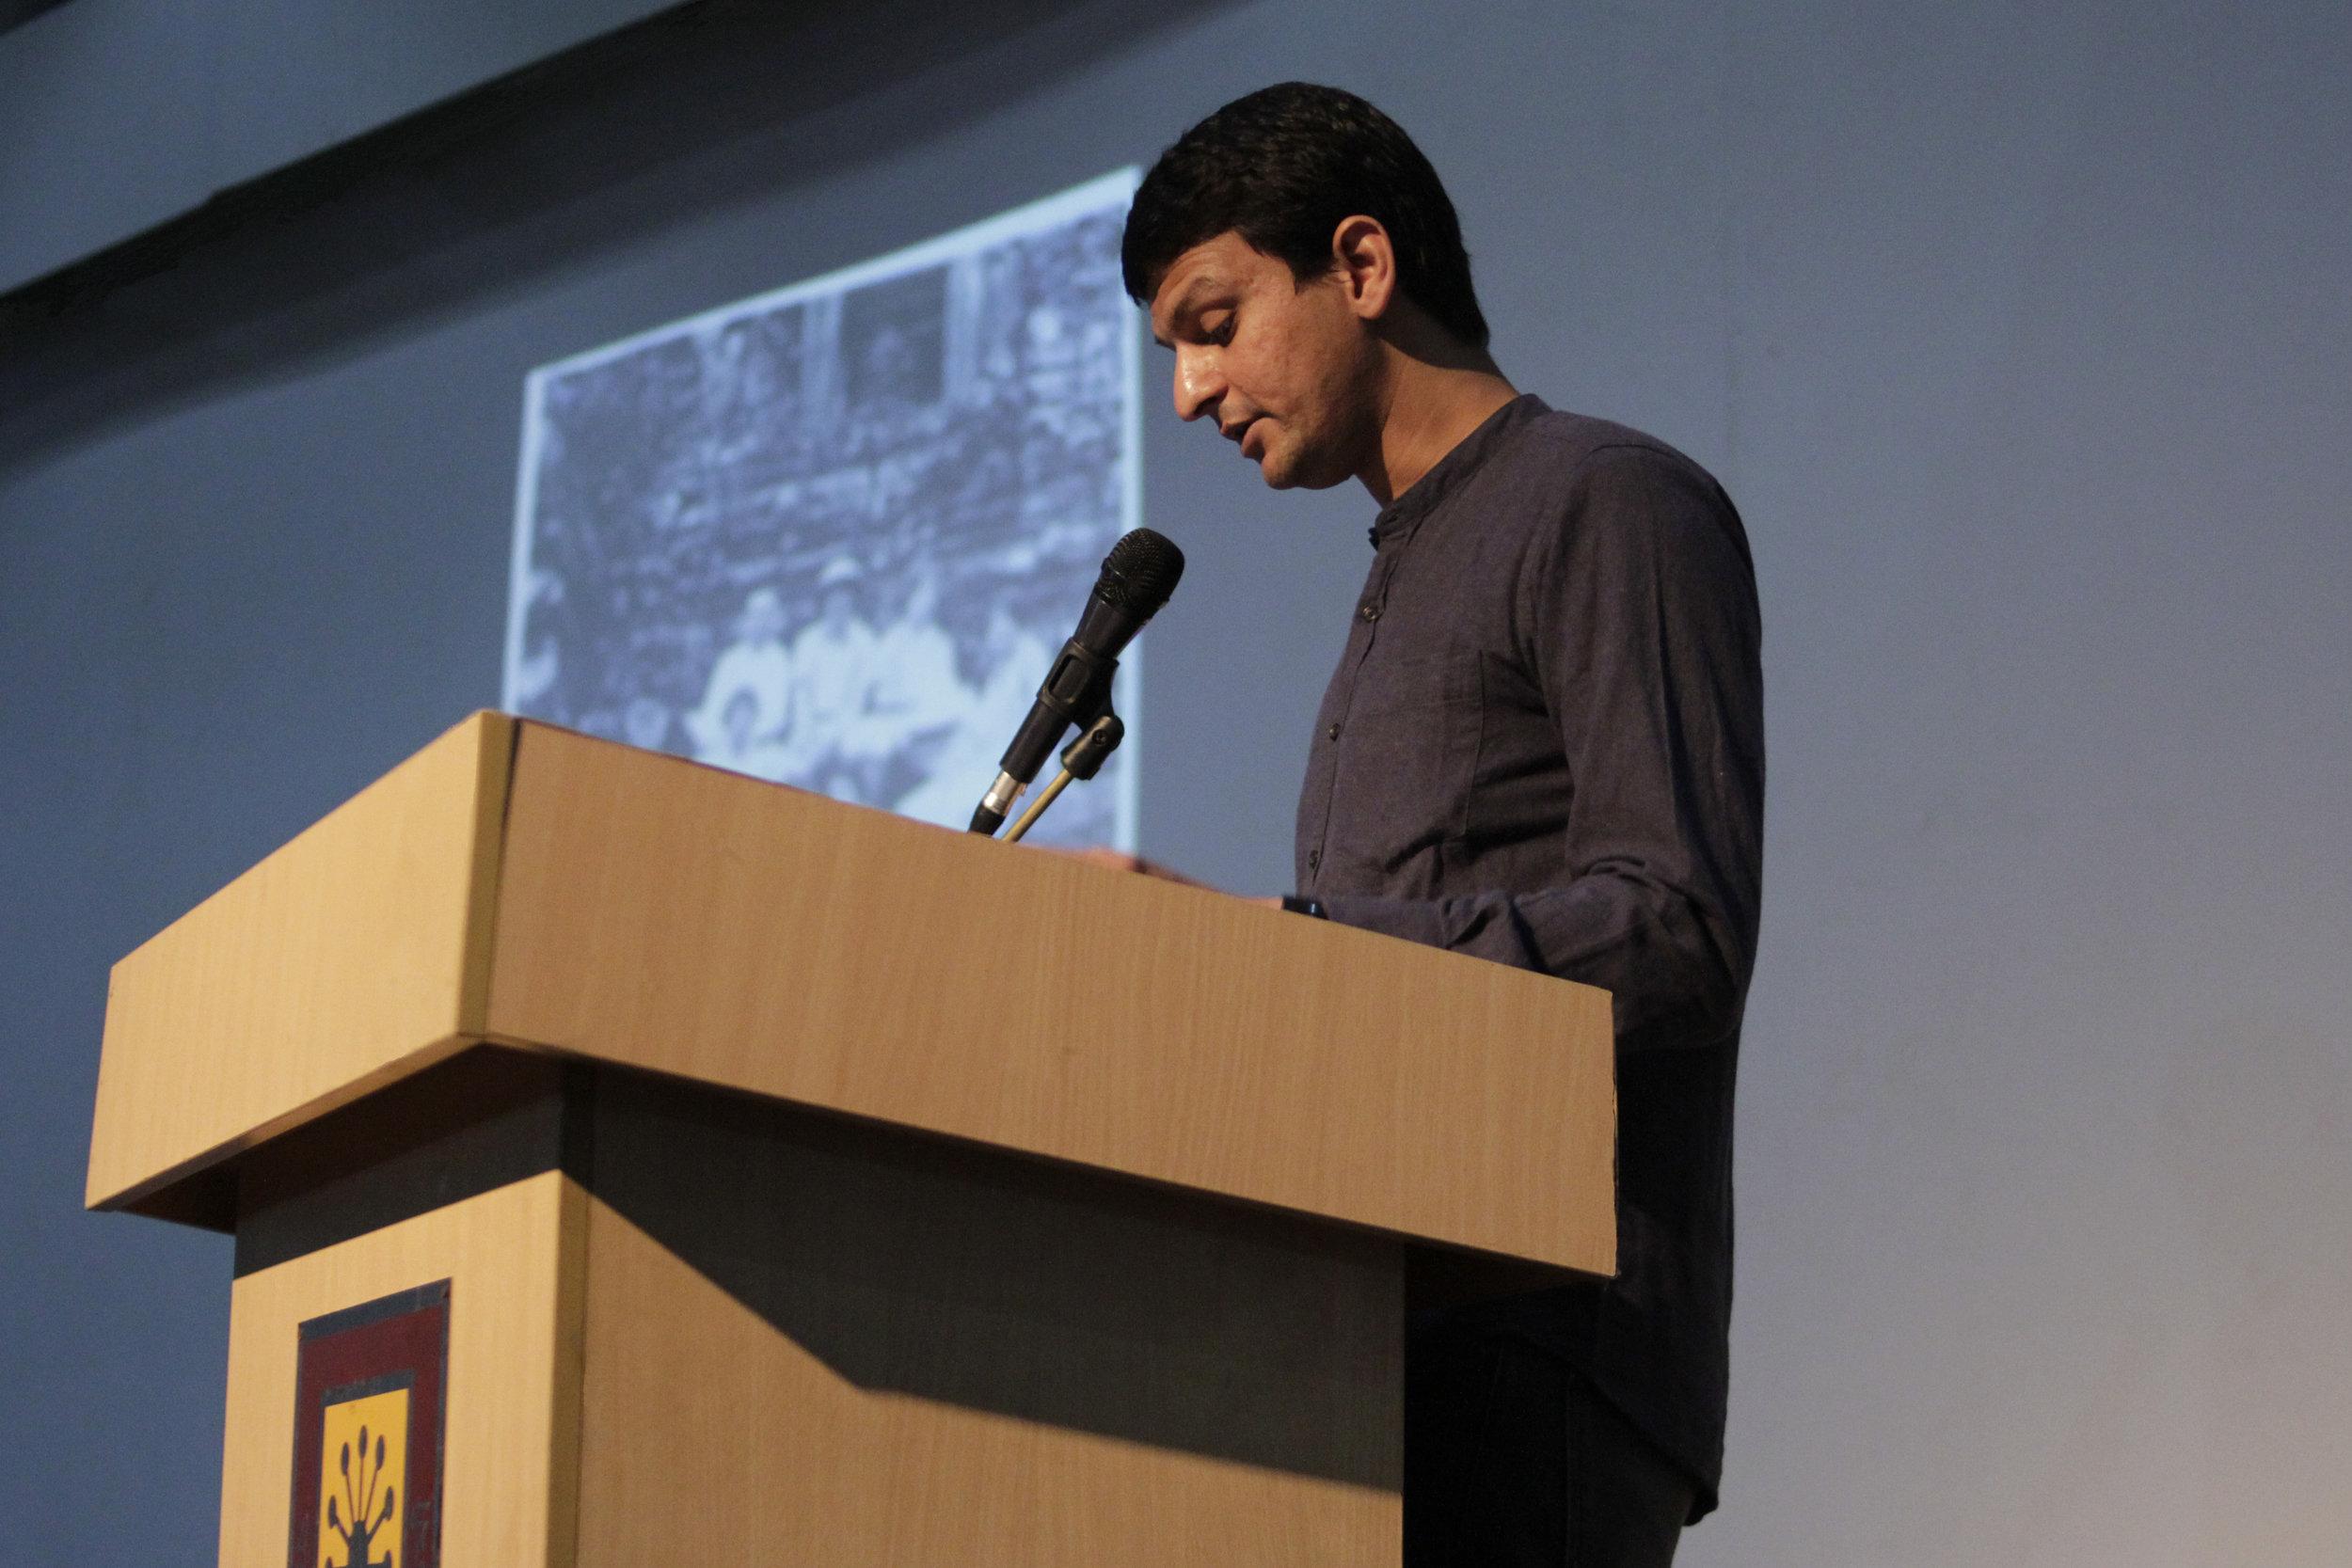 Shabbir Hussain Mustafa, Still Reading Coomaraswamy